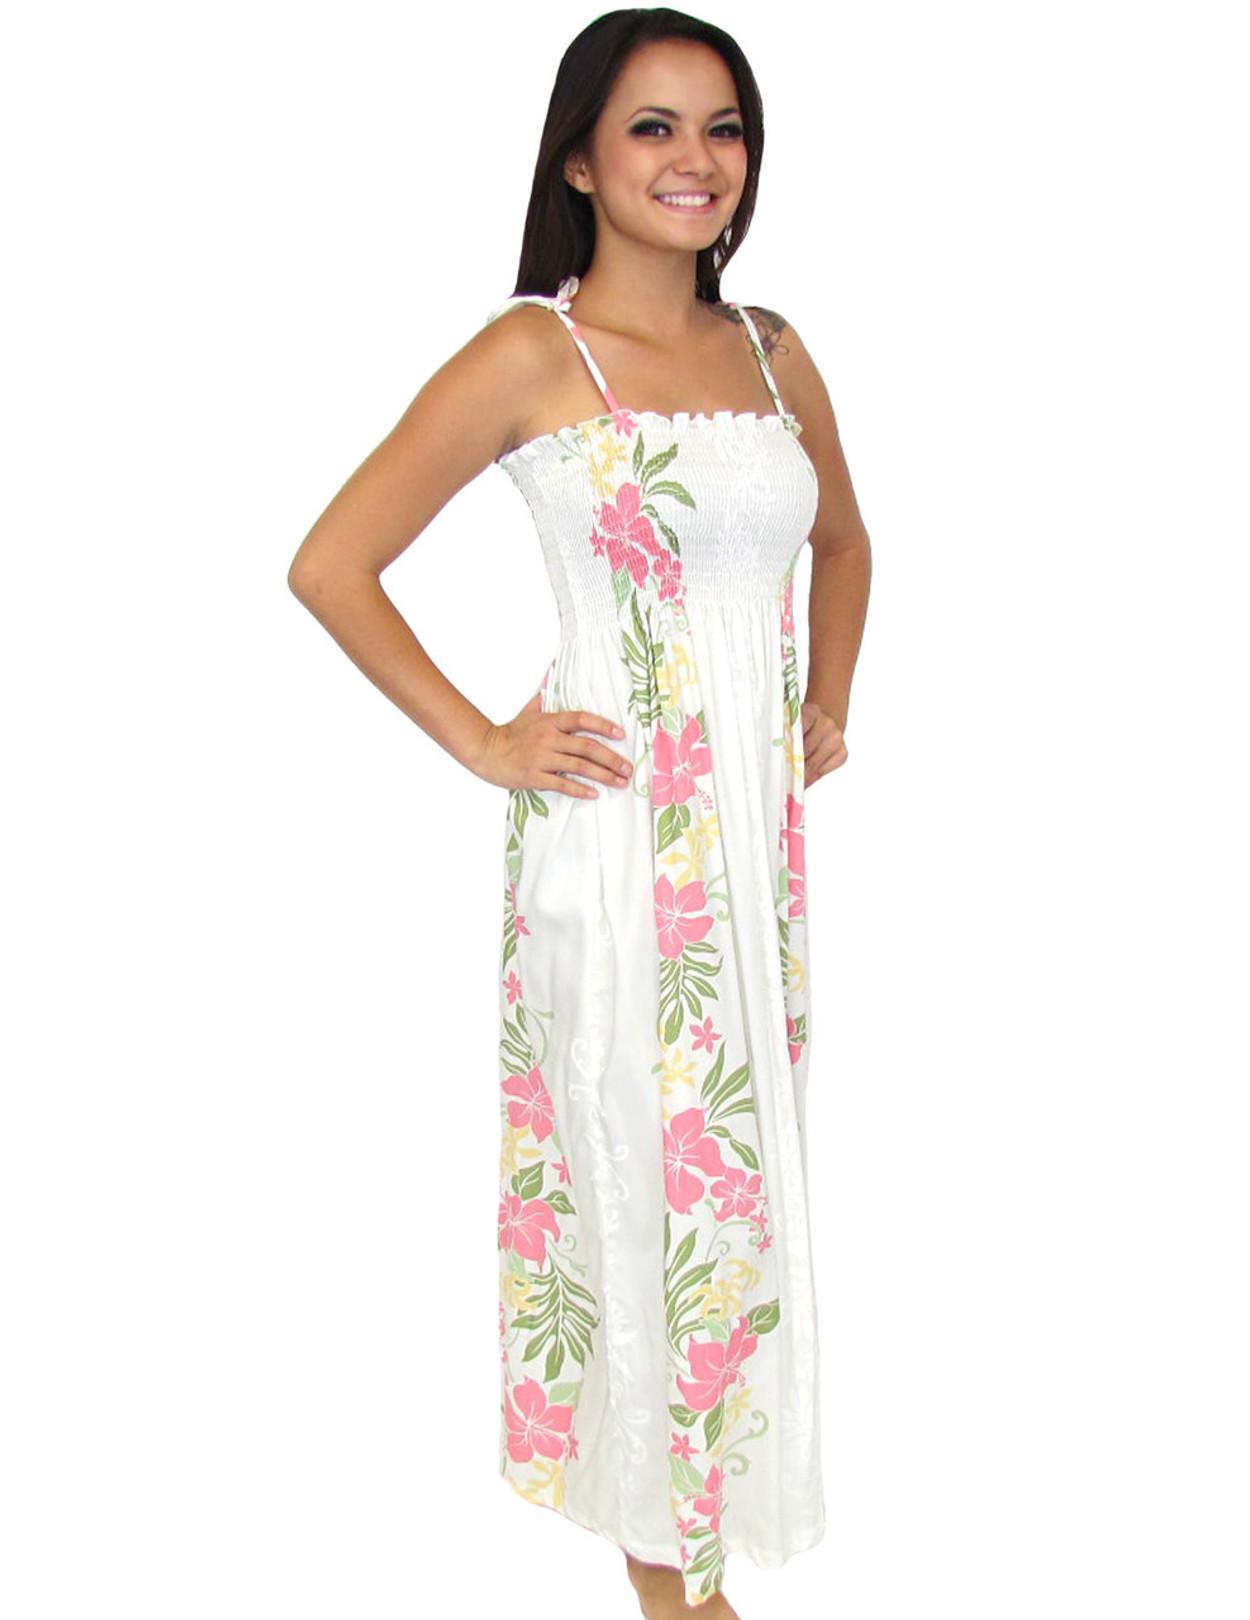 ba32f45424e4 Maxi Long Floral White Dress Lokelani Smock Tube Top 100% Rayon Fabric  Smocked Tube Top